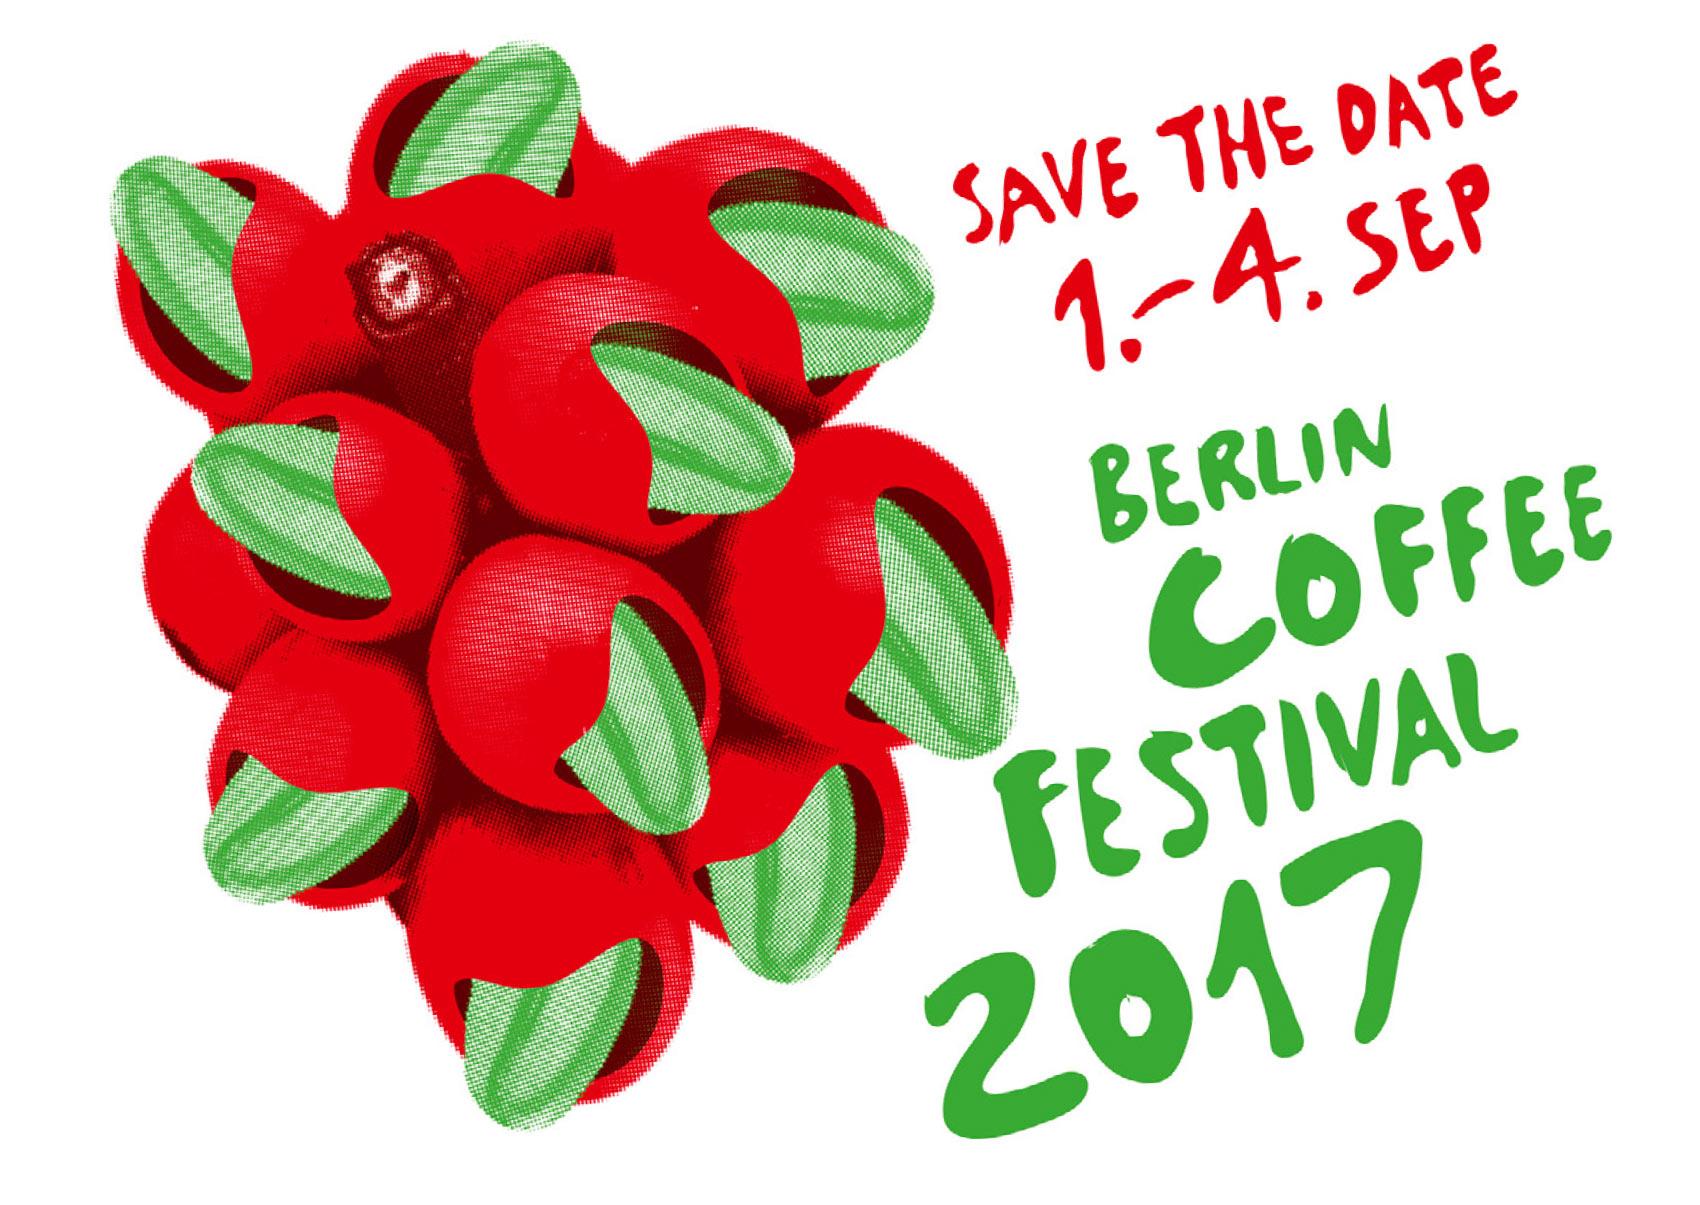 Der Kaffeekalender Veranstaltungen Events Kaffee Blog Cafcaf